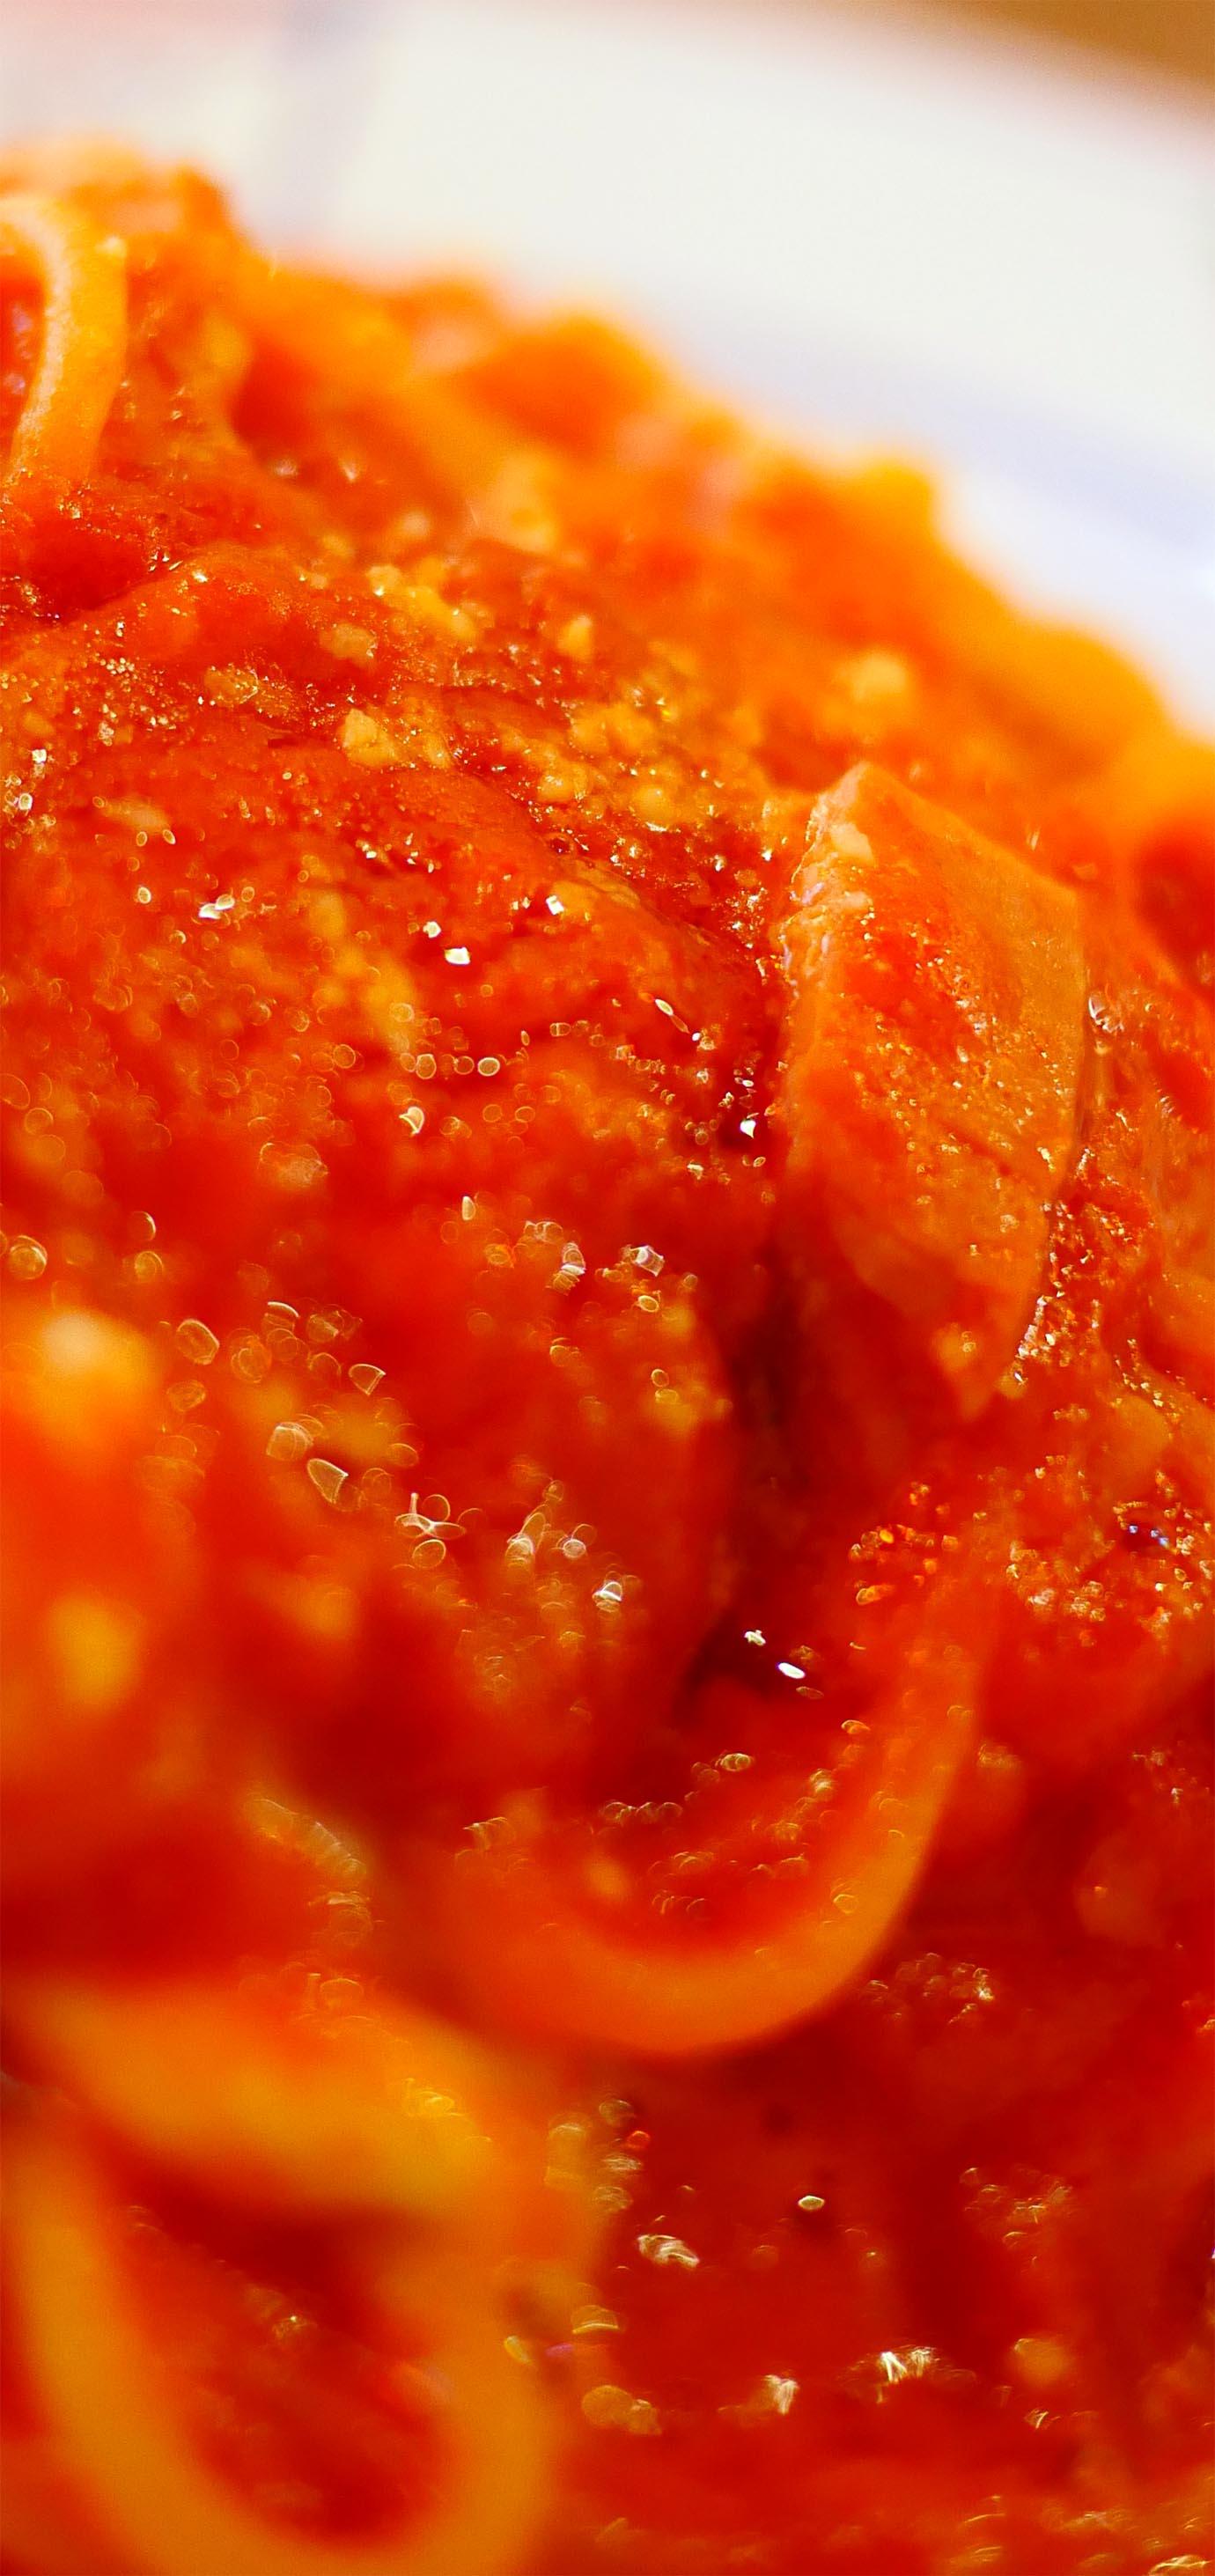 kumamoto-pizza-napoletana-il-forno-doro3